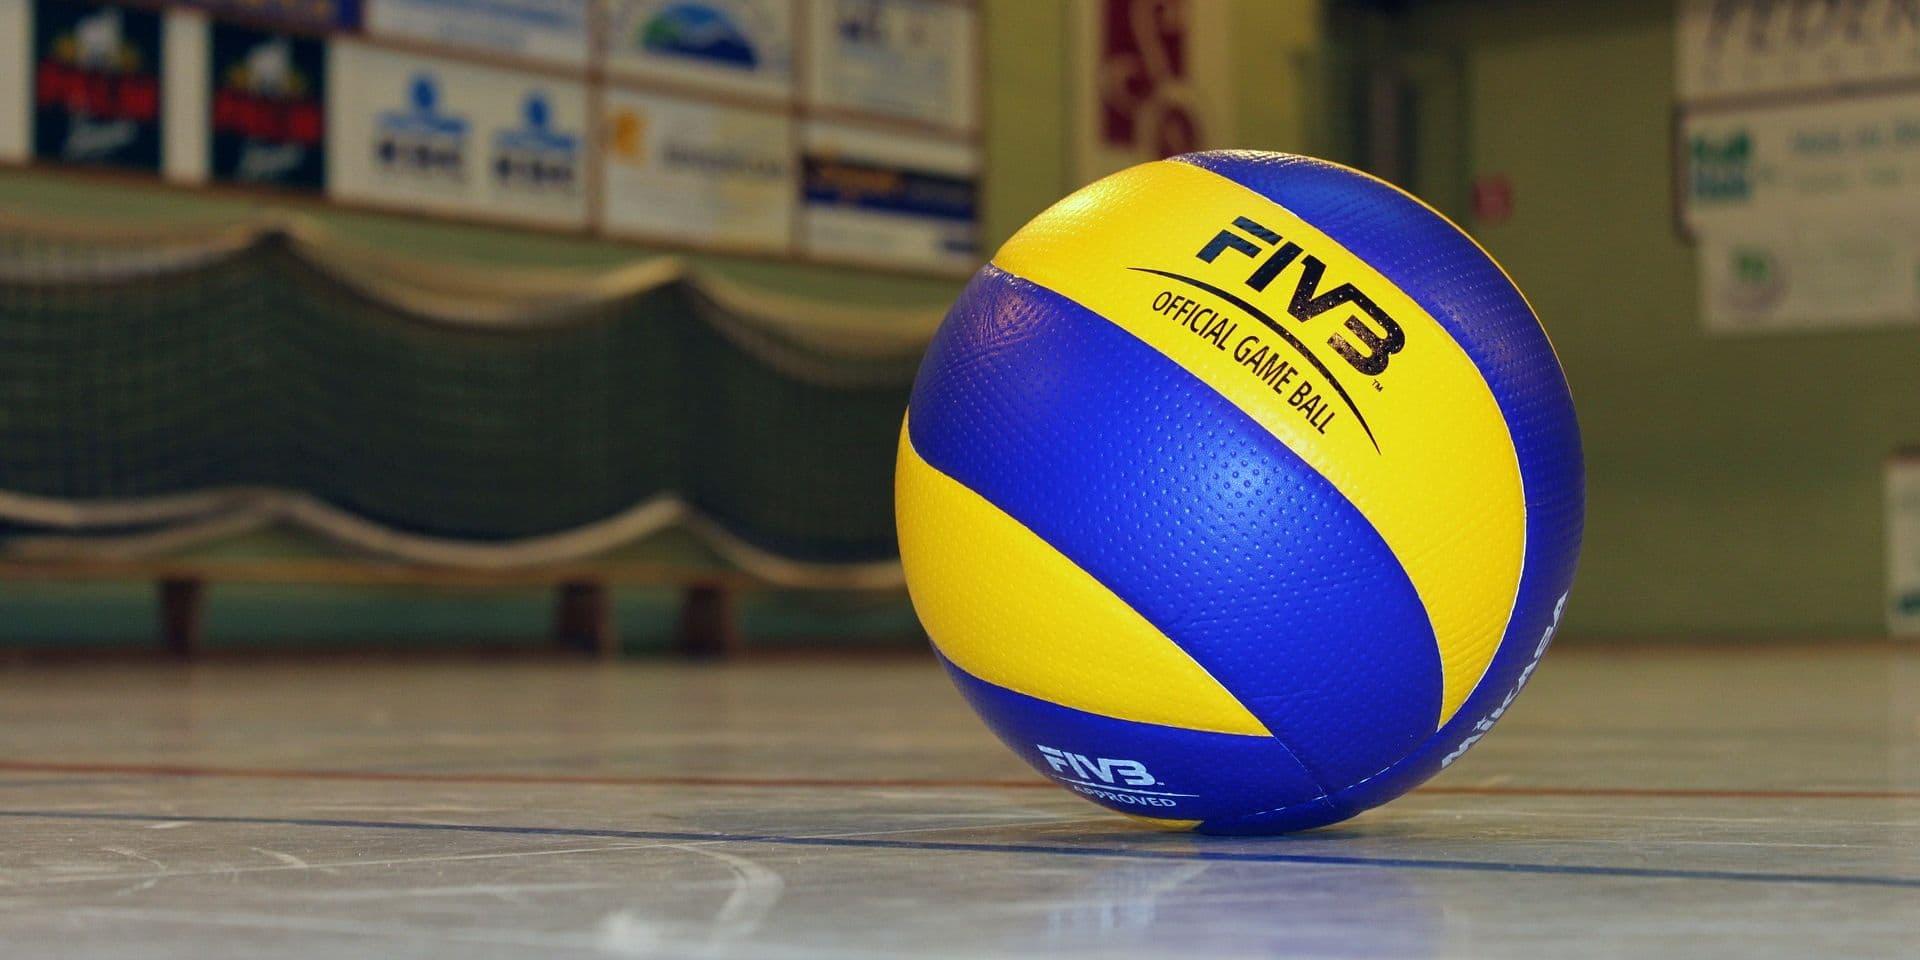 Volley-ball: l'Euromillions Volley League se met aussi en pause ce week-end